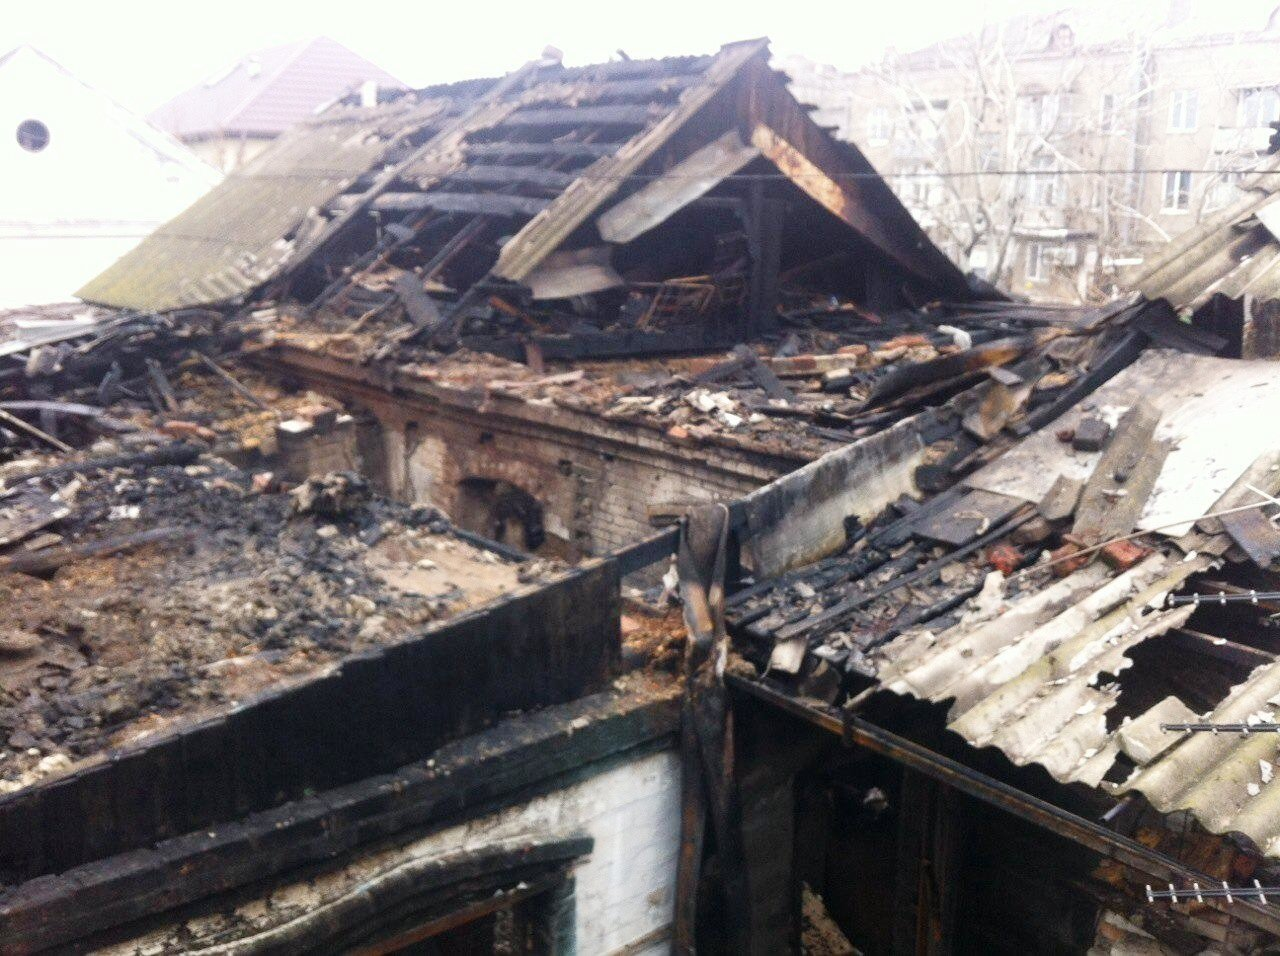 В Бердянске пожар в частном доме тушили 16 спасателей, – ФОТО, фото-3